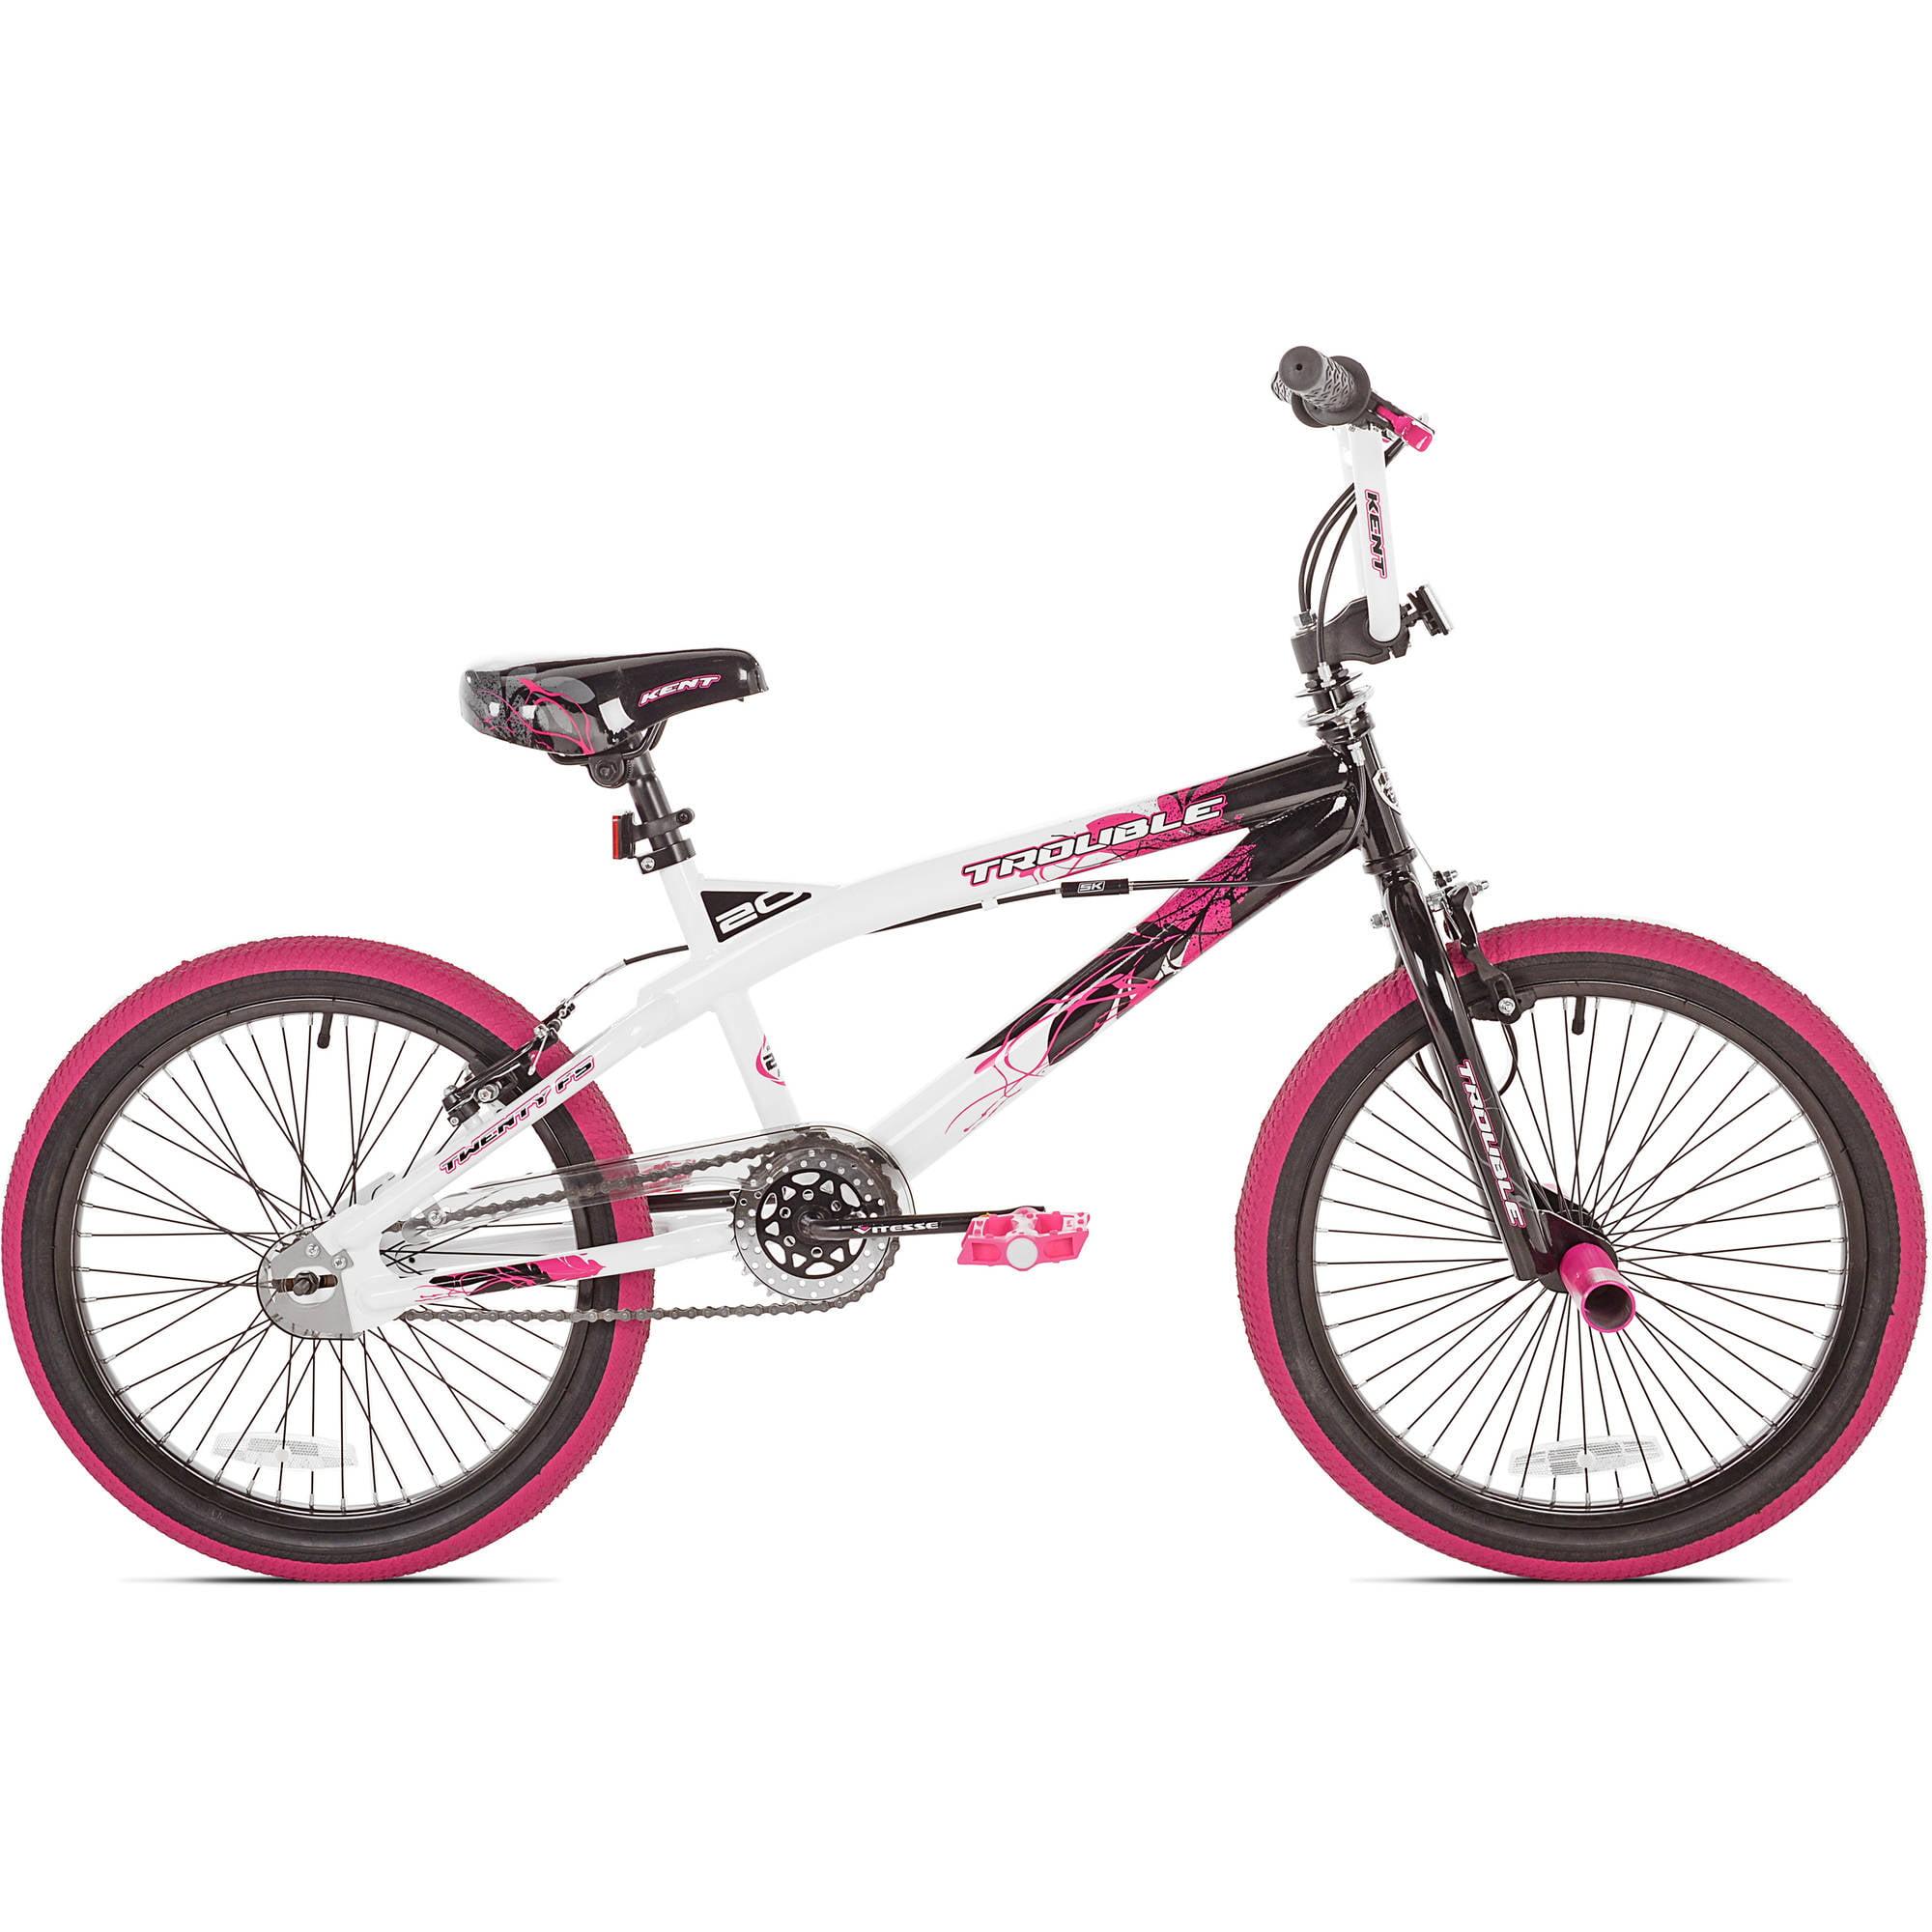 "20"" Kent Trouble Girls' Bike, Pink/Black"